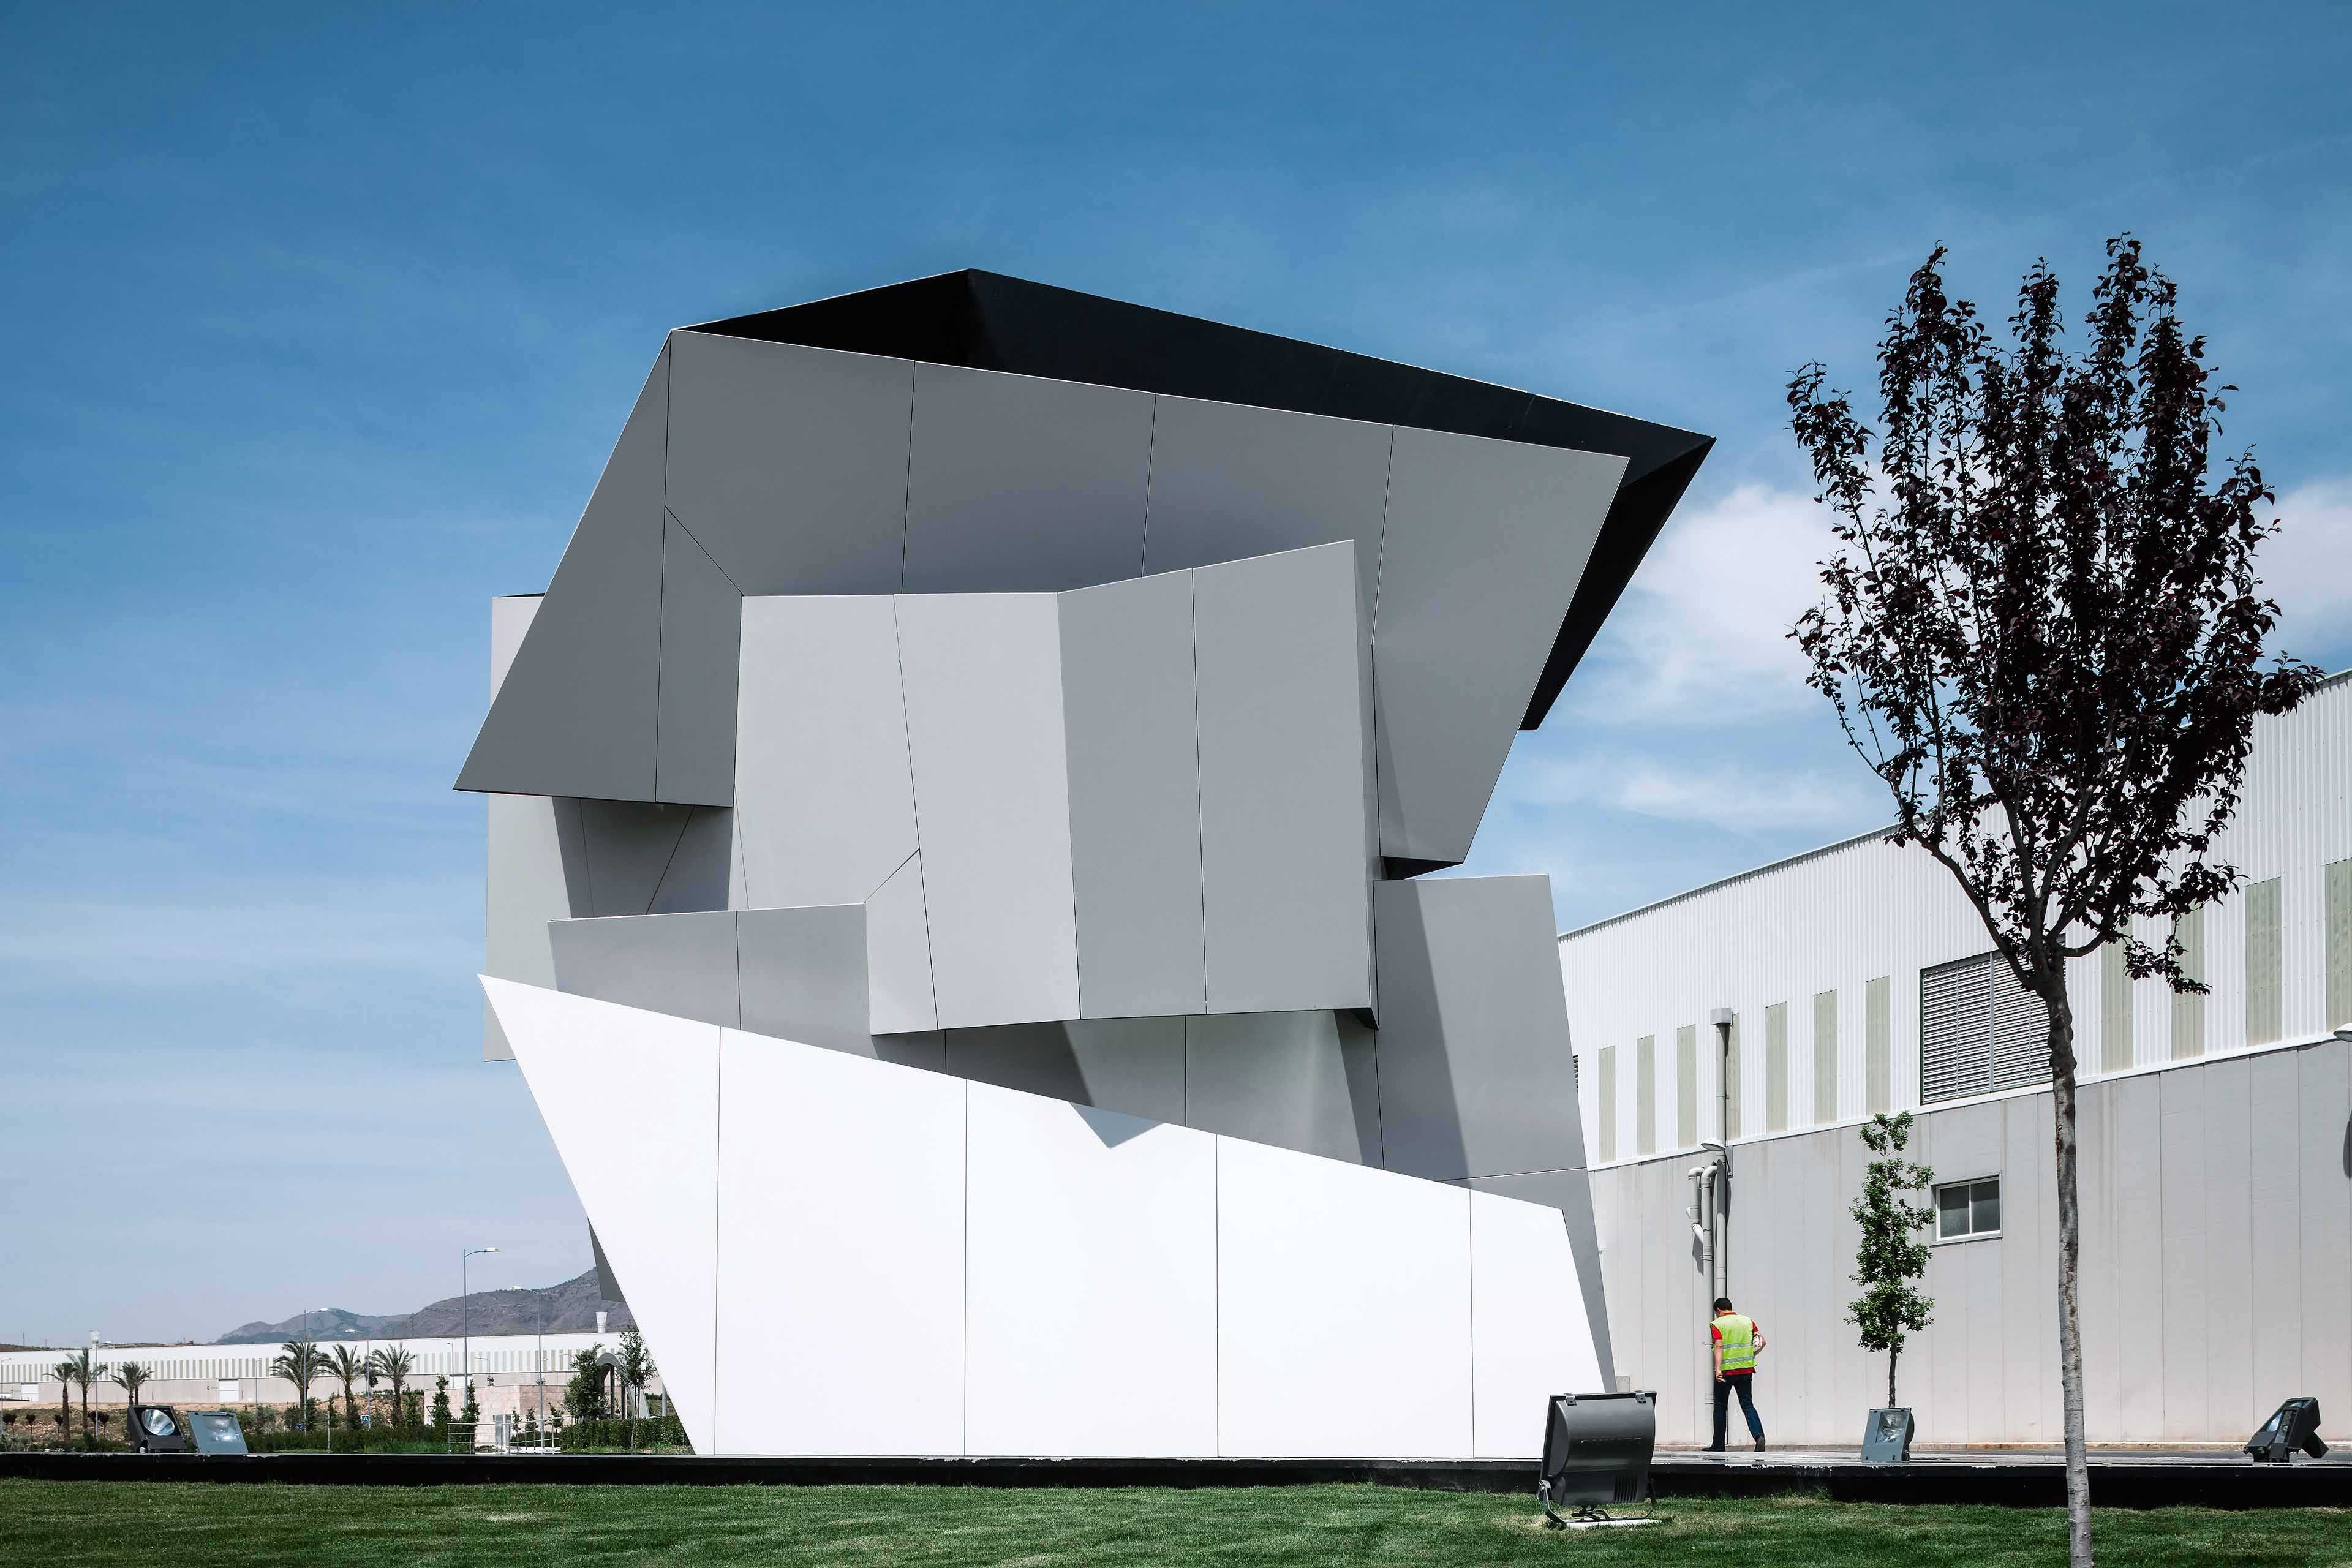 Daniel Libeskind's Sculptures  - Libeskind Alda 35